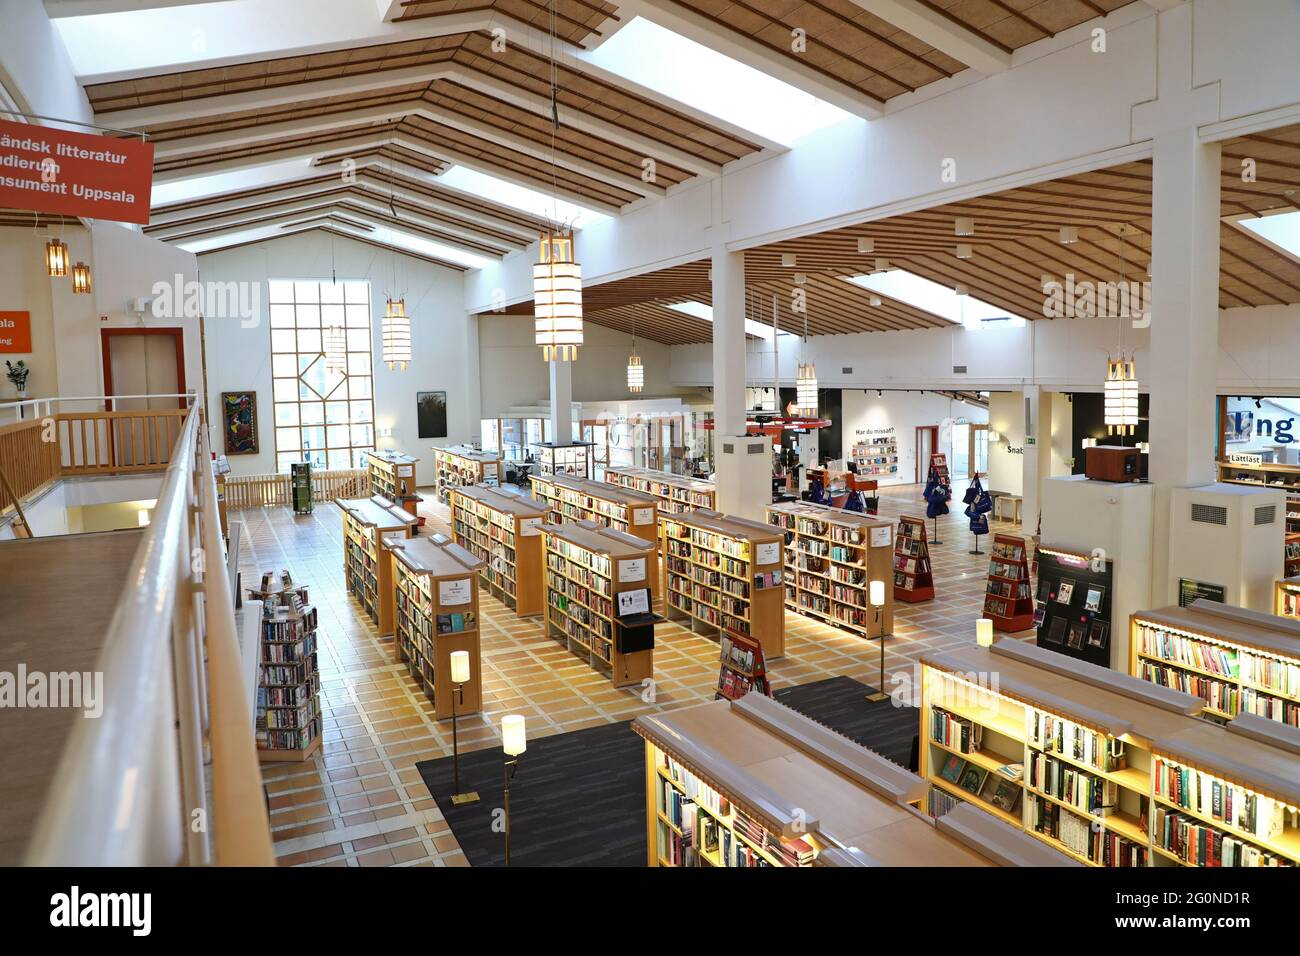 Uppsala city library in the city of Uppsala, Sweden. Stock Photo